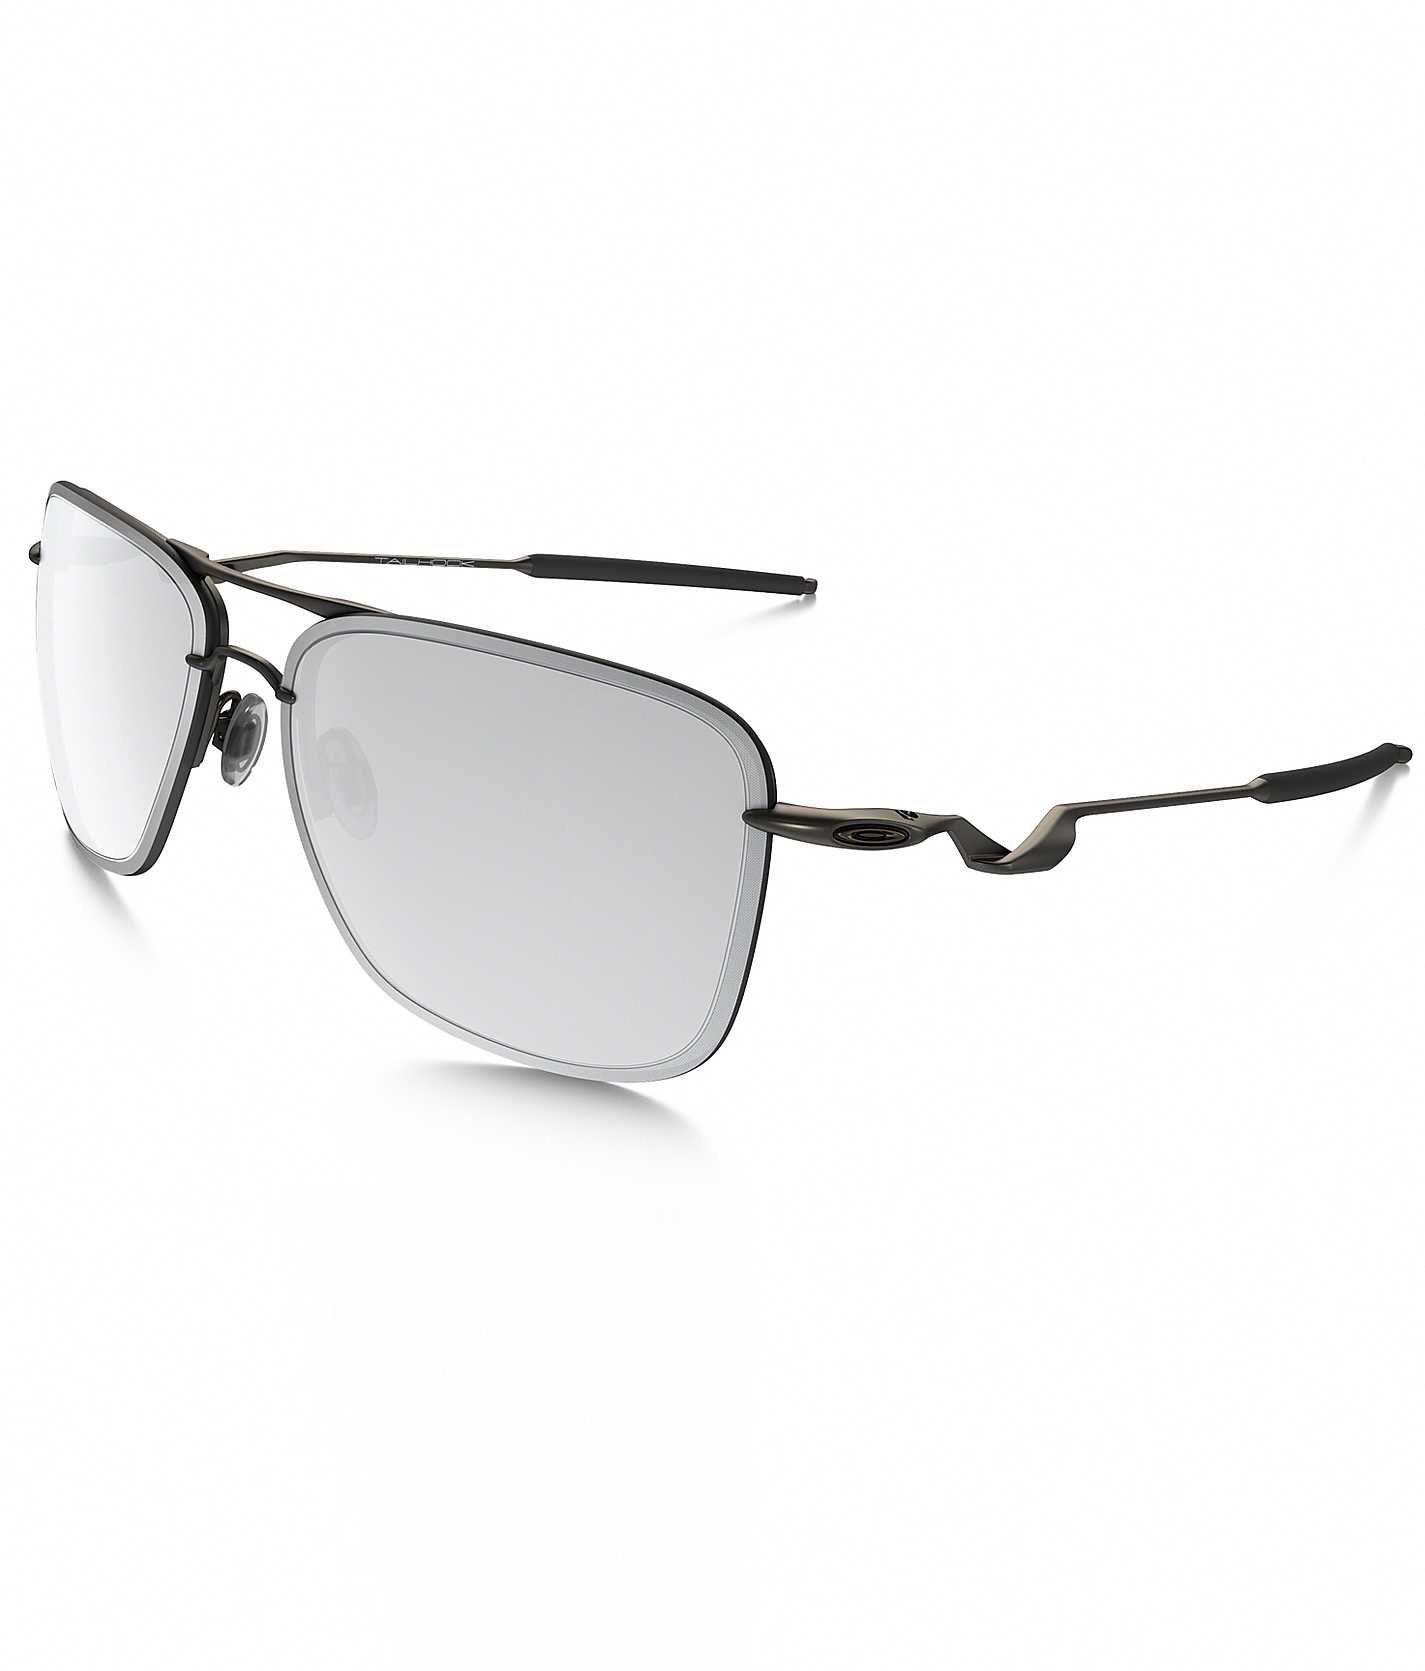 5be9857d222 Oakley Tailhook Sunglasses - Men s Accessories